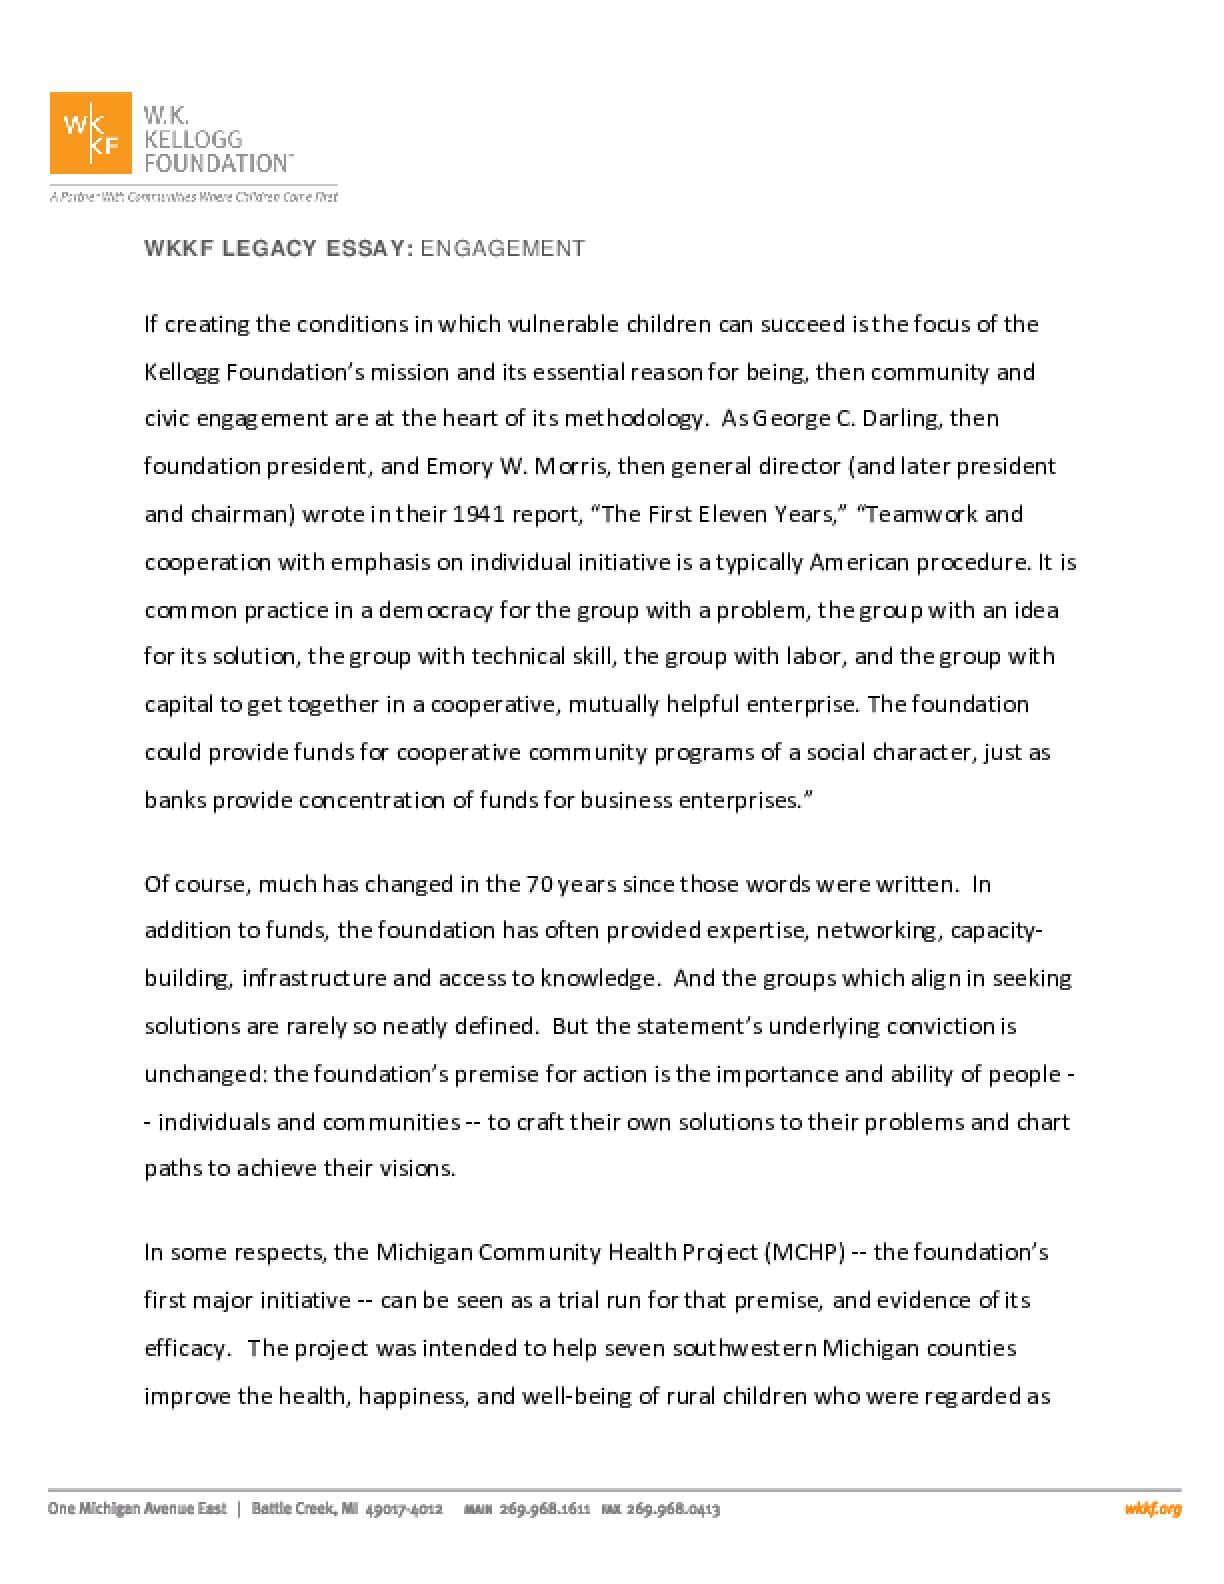 WKKF Legacy Essay: Engagement